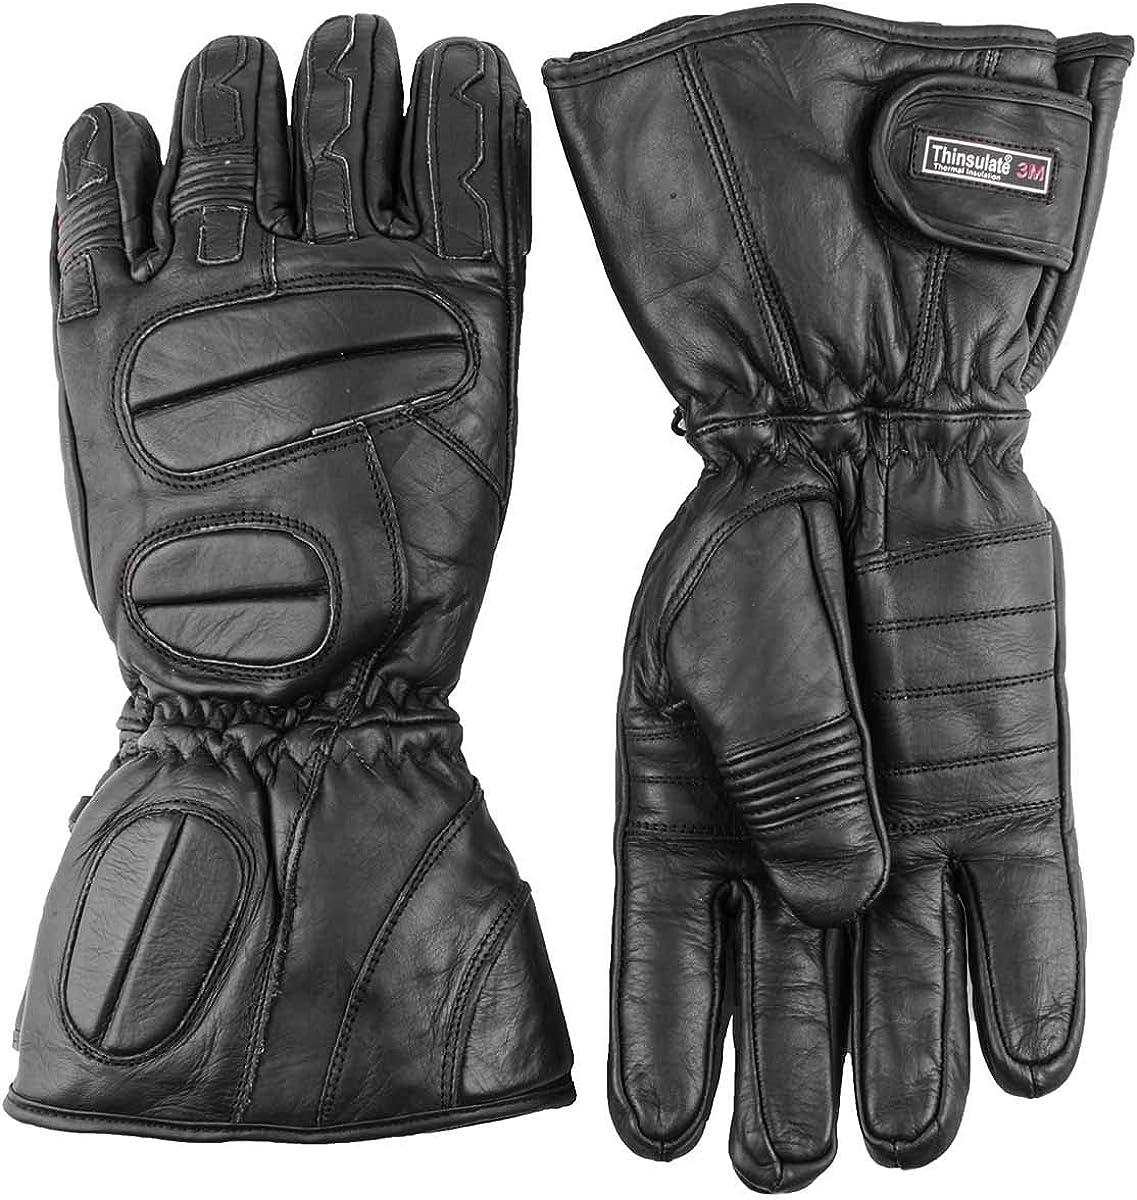 Premium Leather Snowmobile Gloves Gauntlet Snow Ski Cold Weather ( 2XL XXL )